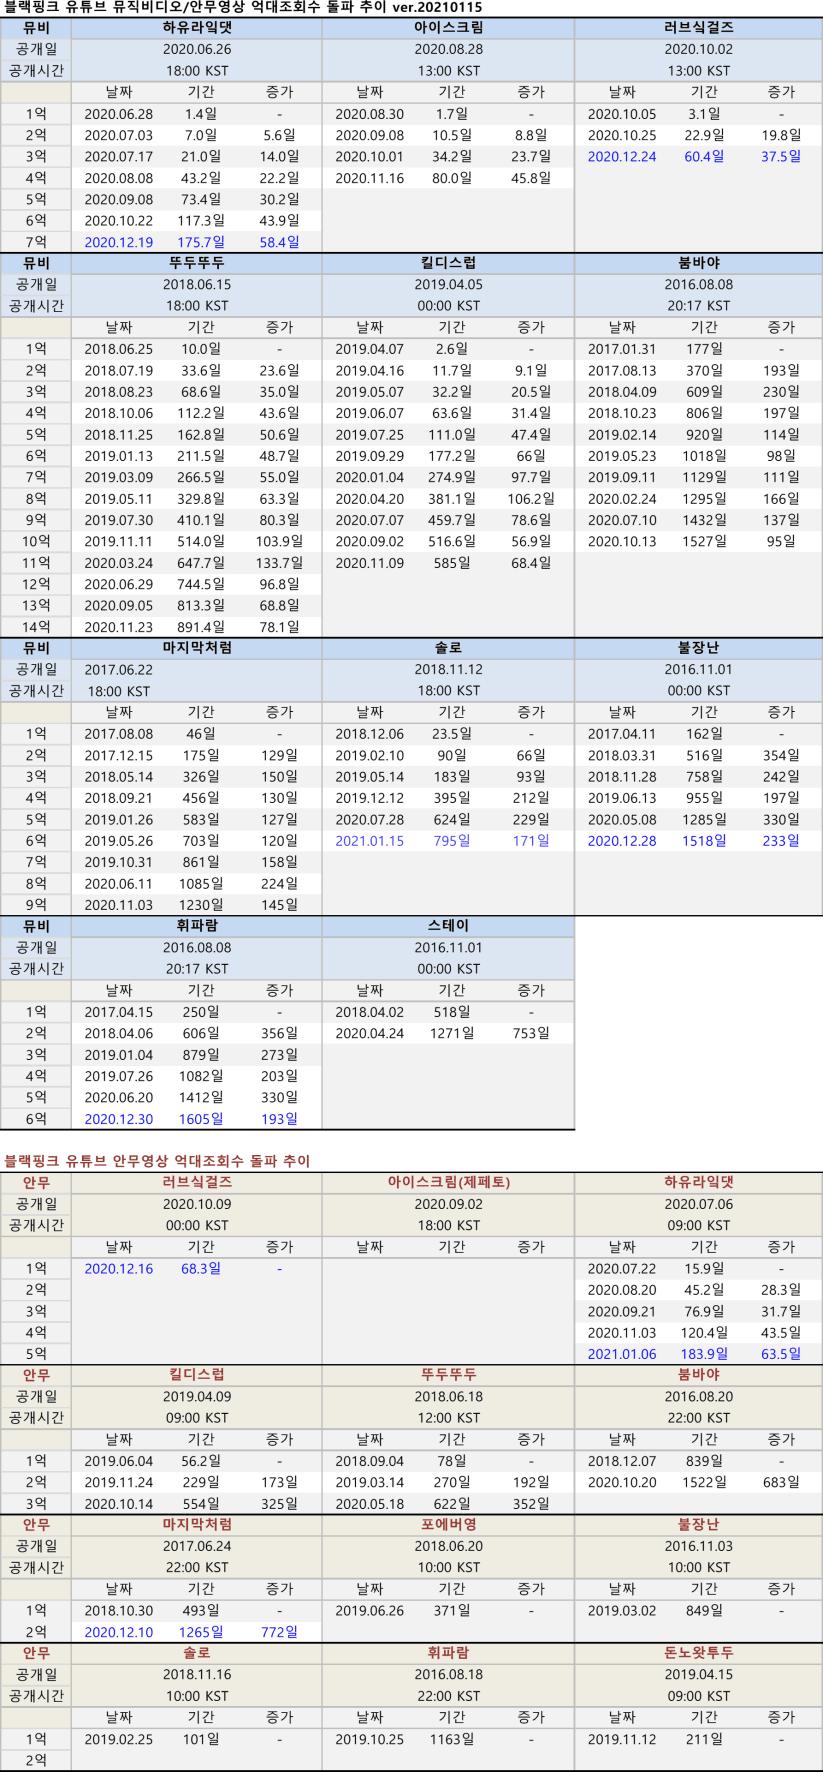 viewimage.php?id=2fb1d125eec231a865&no=24b0d769e1d32ca73fec82fa11d028313f7ca0229f7ff0a914a04ad5fd599e1c3a03d8081273a64561aa422884e6026f7b3b3fcfbc928c9aa4dc1dc98751b058fd380b1b